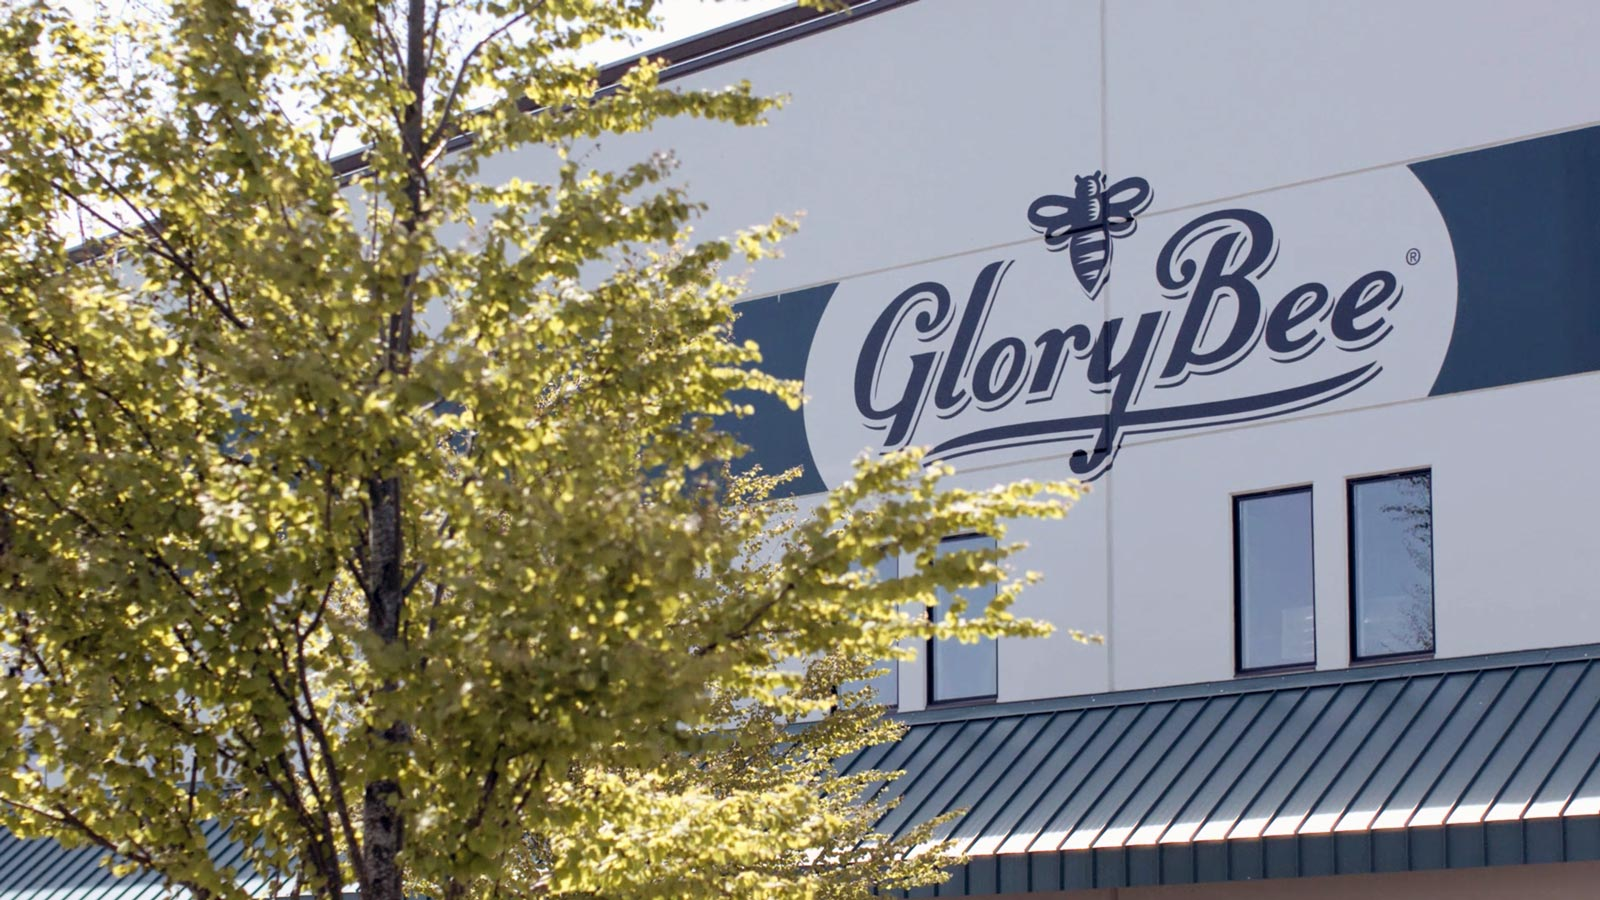 GloryBee sign on building